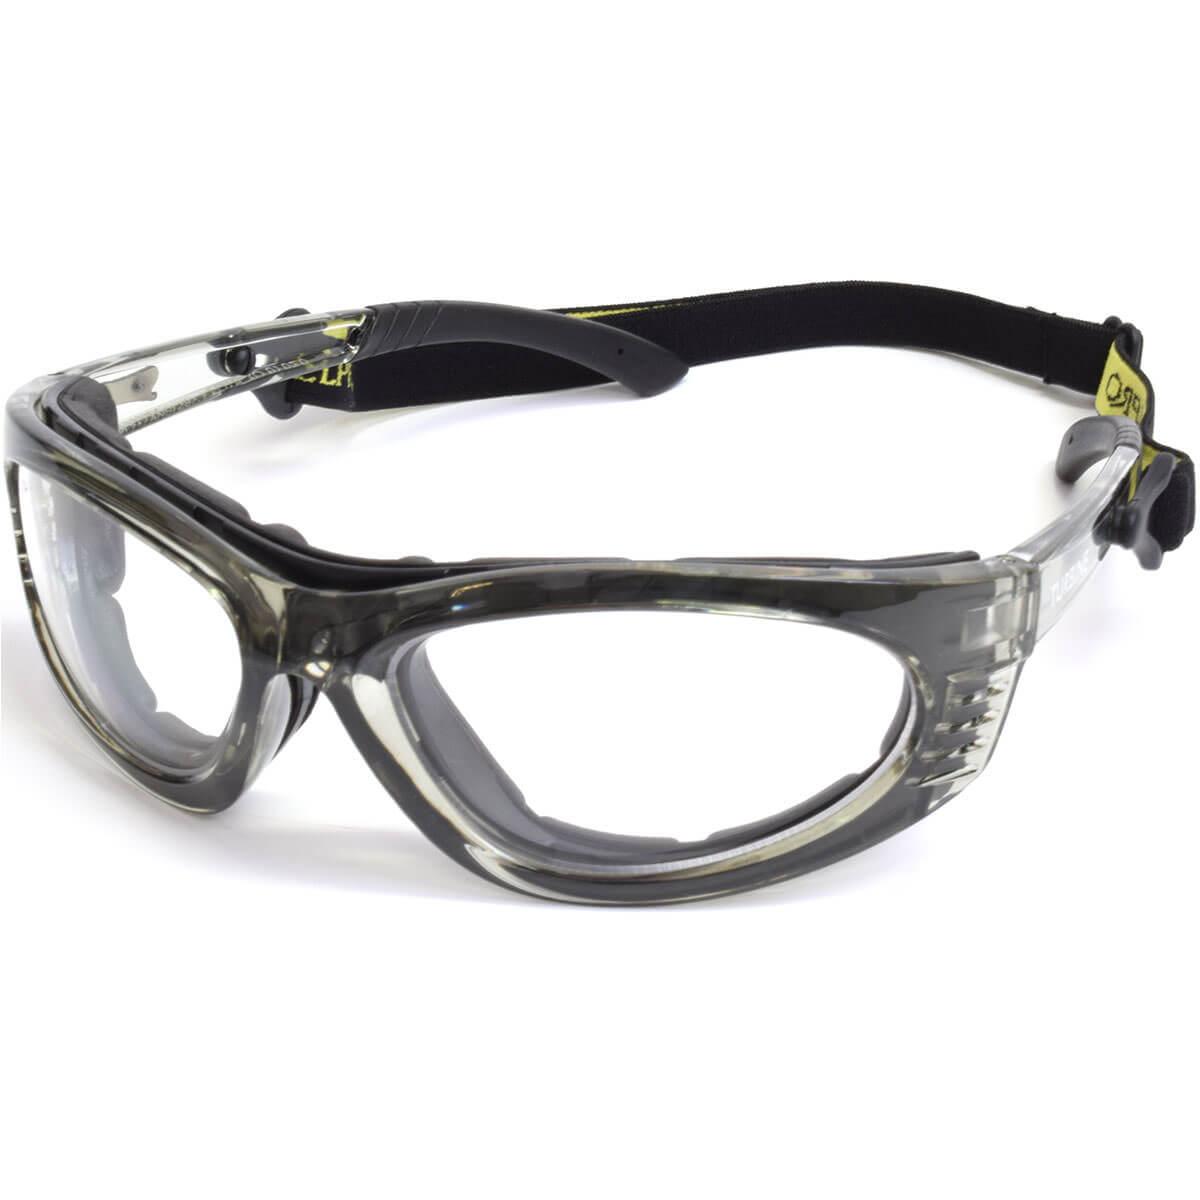 b3413d025daaa Óculos de Segurança Lente Incolor Turbine Steelpro VIC58110 Vicsa